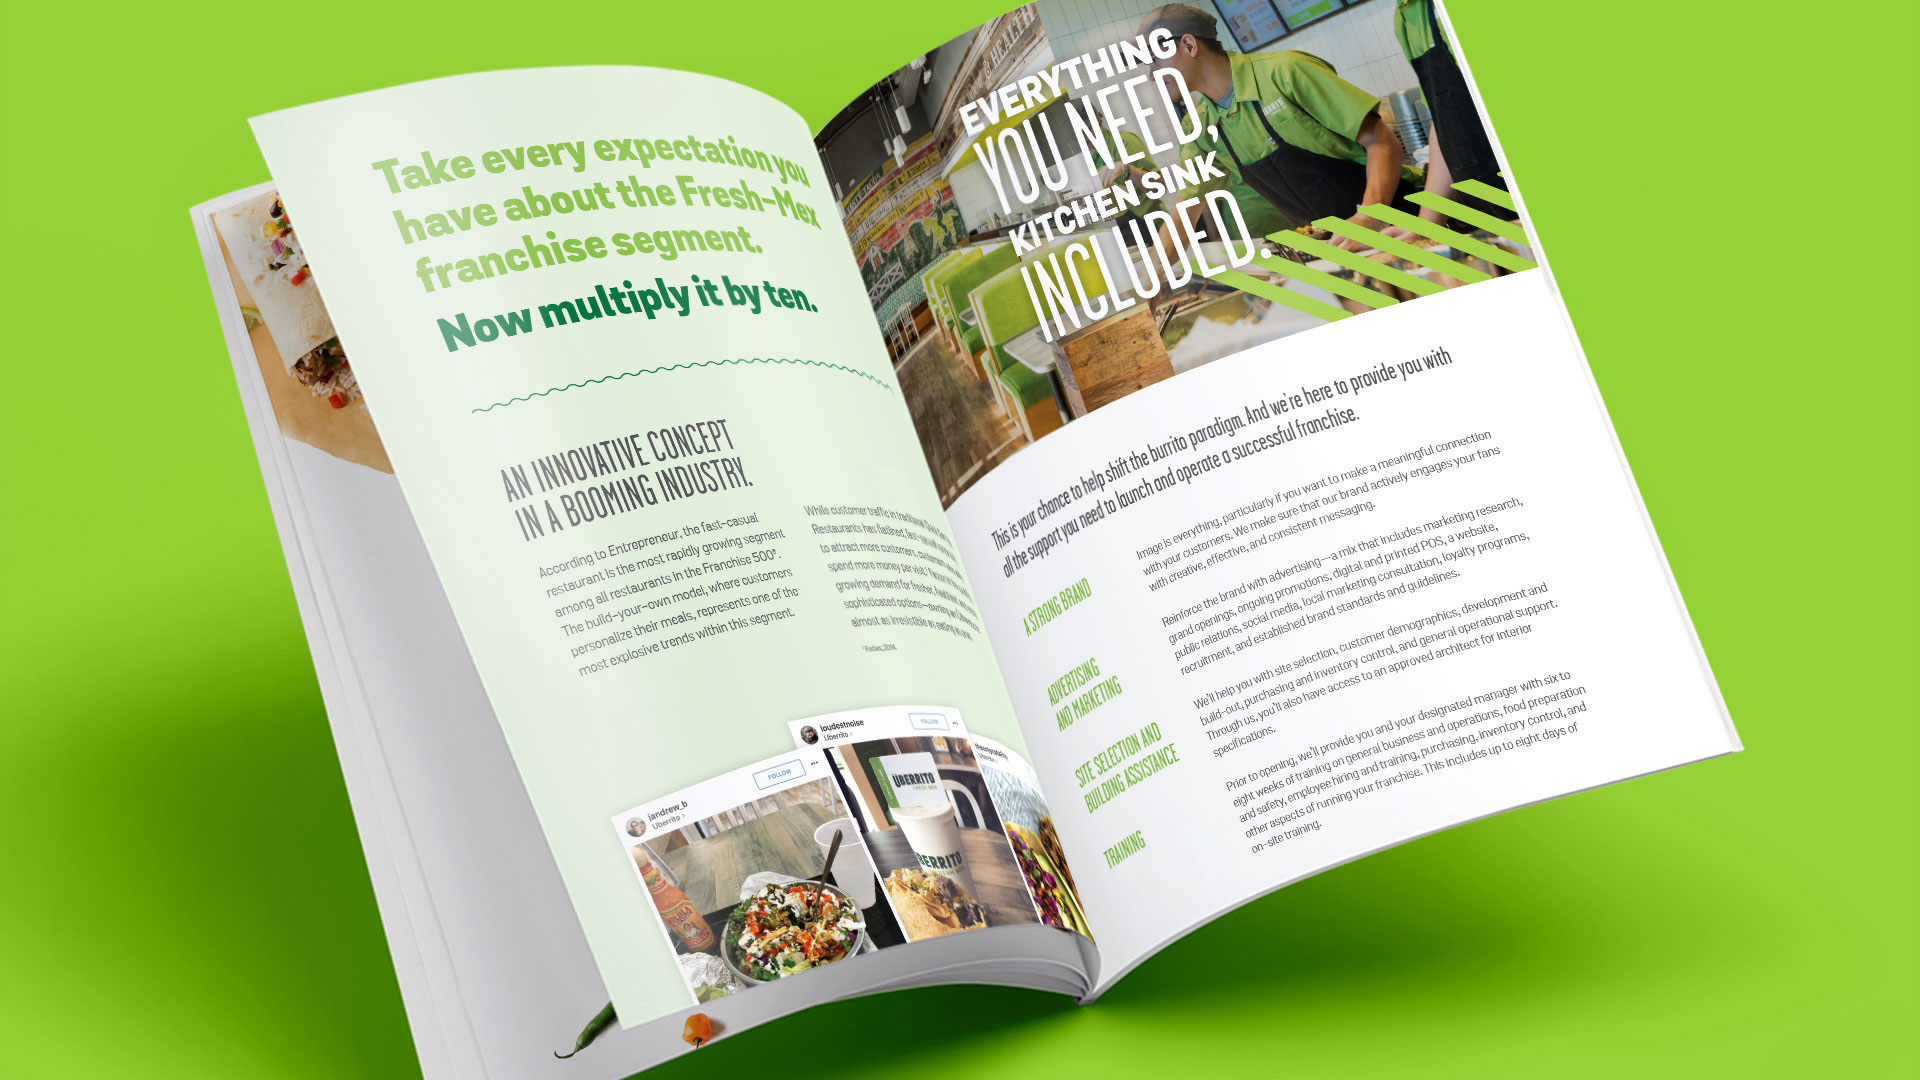 Uberrito fast-casual restaurant franchise brochure